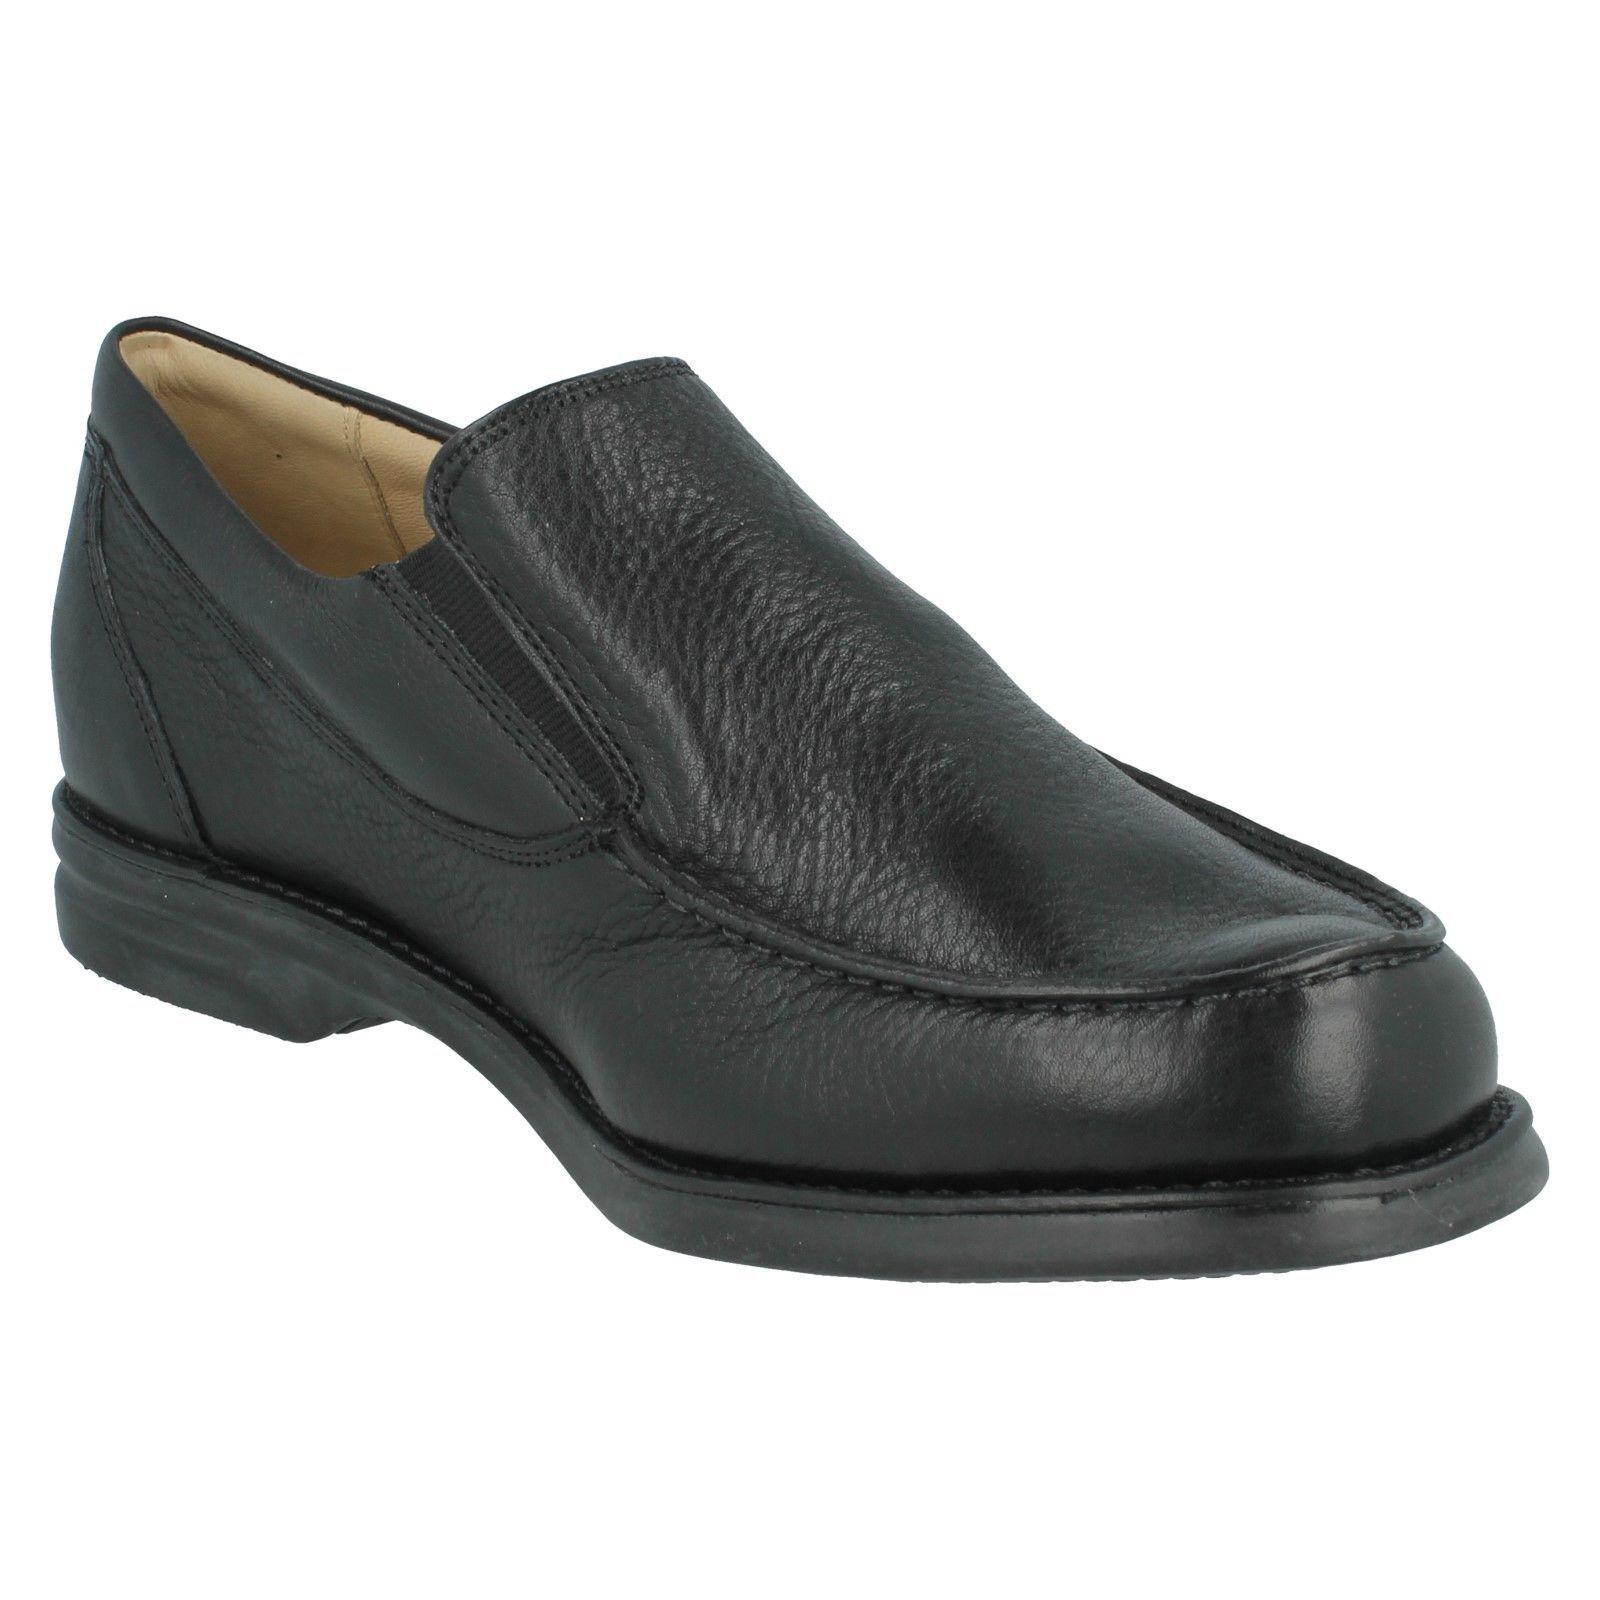 Herren Anatomic Slip & Co gekörntes Leder Slip Anatomic On Schuhe Bernardo af91da